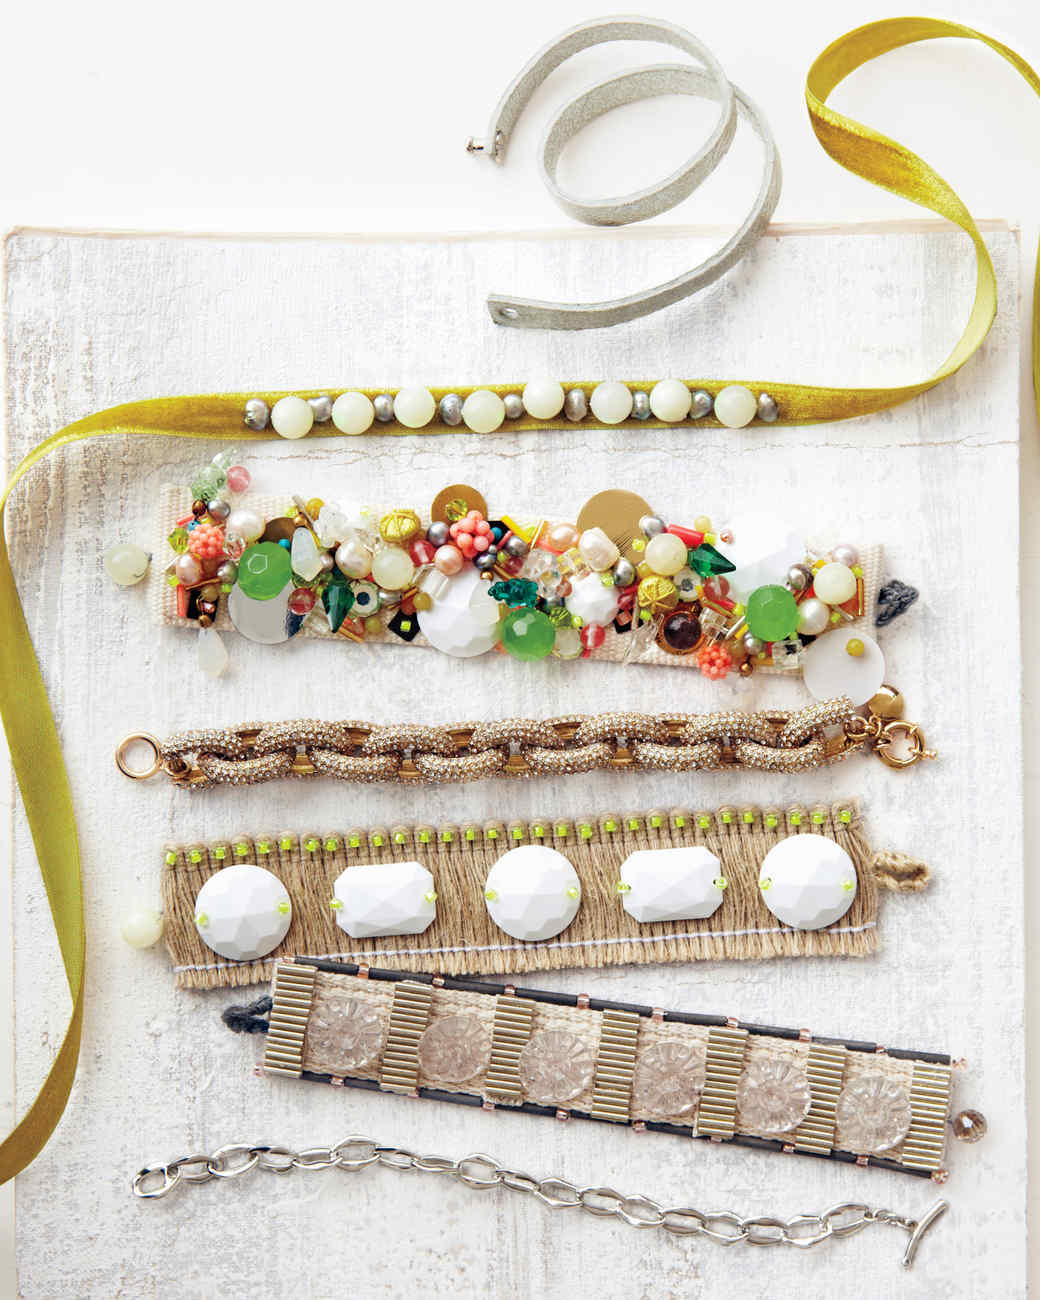 bracelets-0511mld107086.jpg